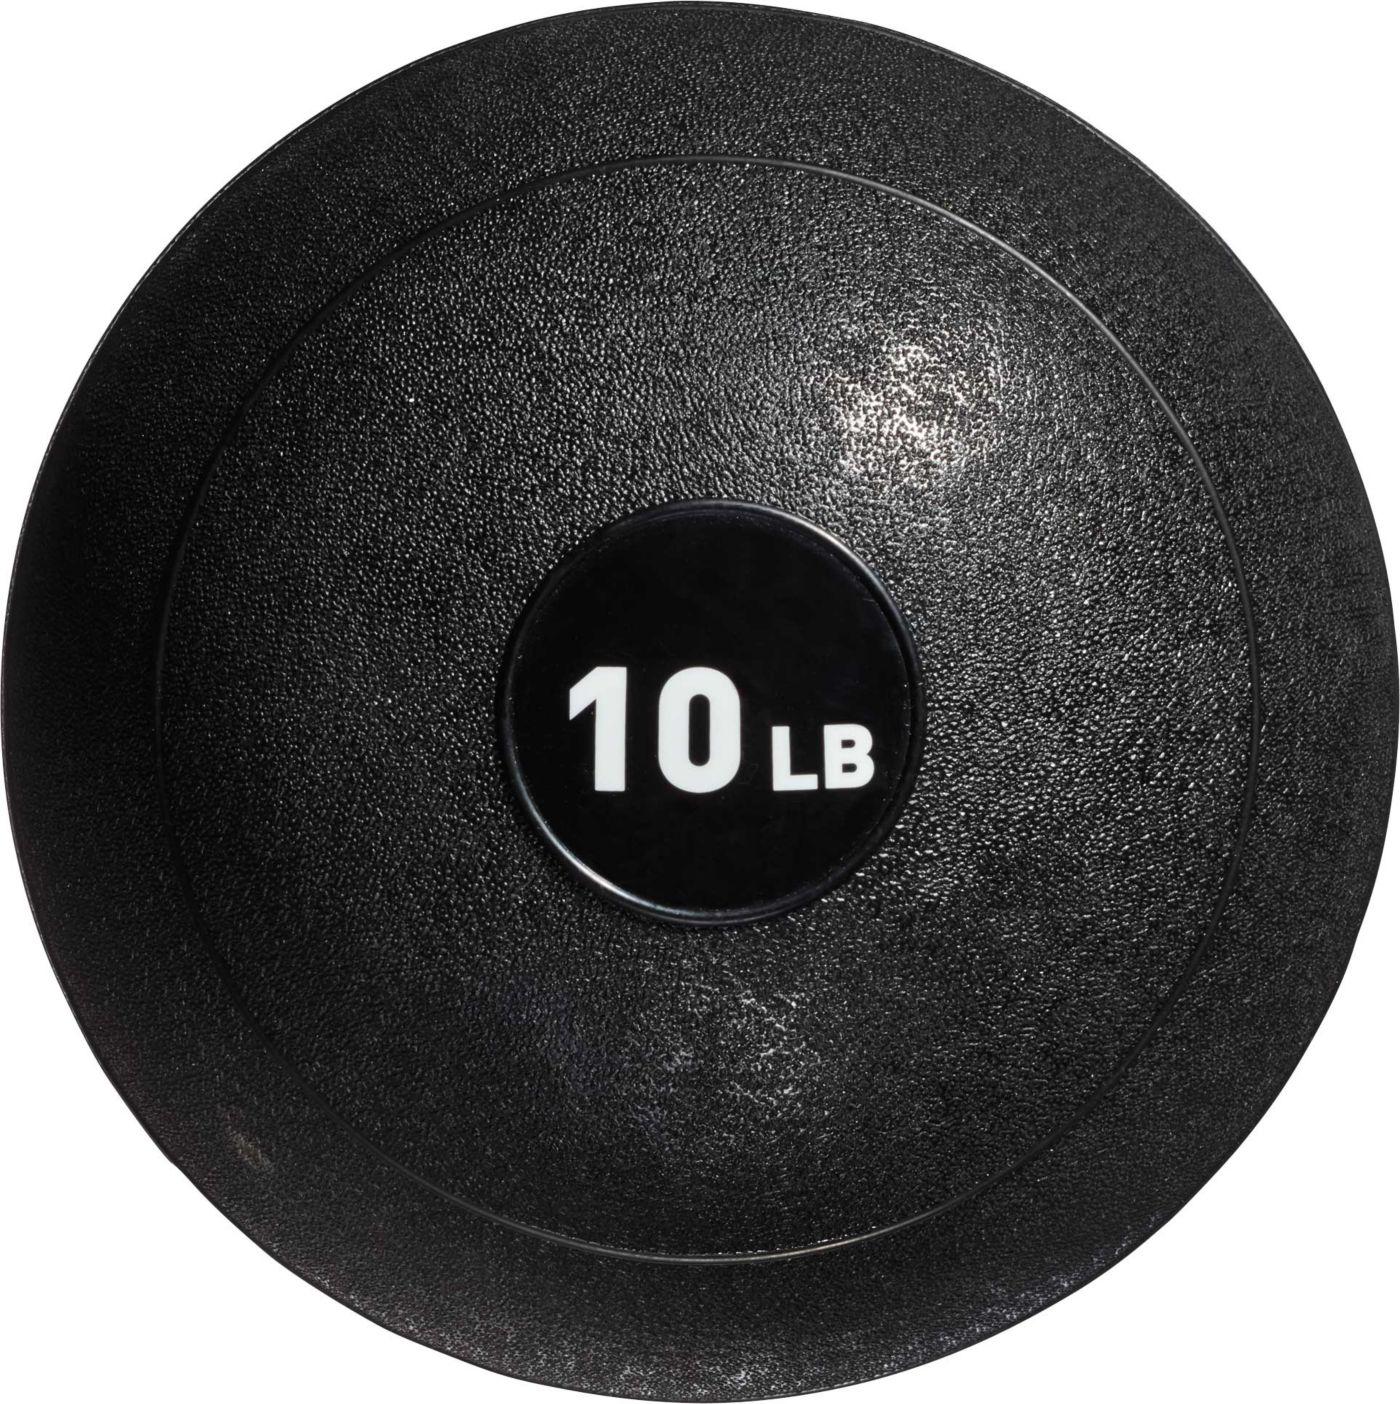 ETHOS 10 lb. Slam Ball